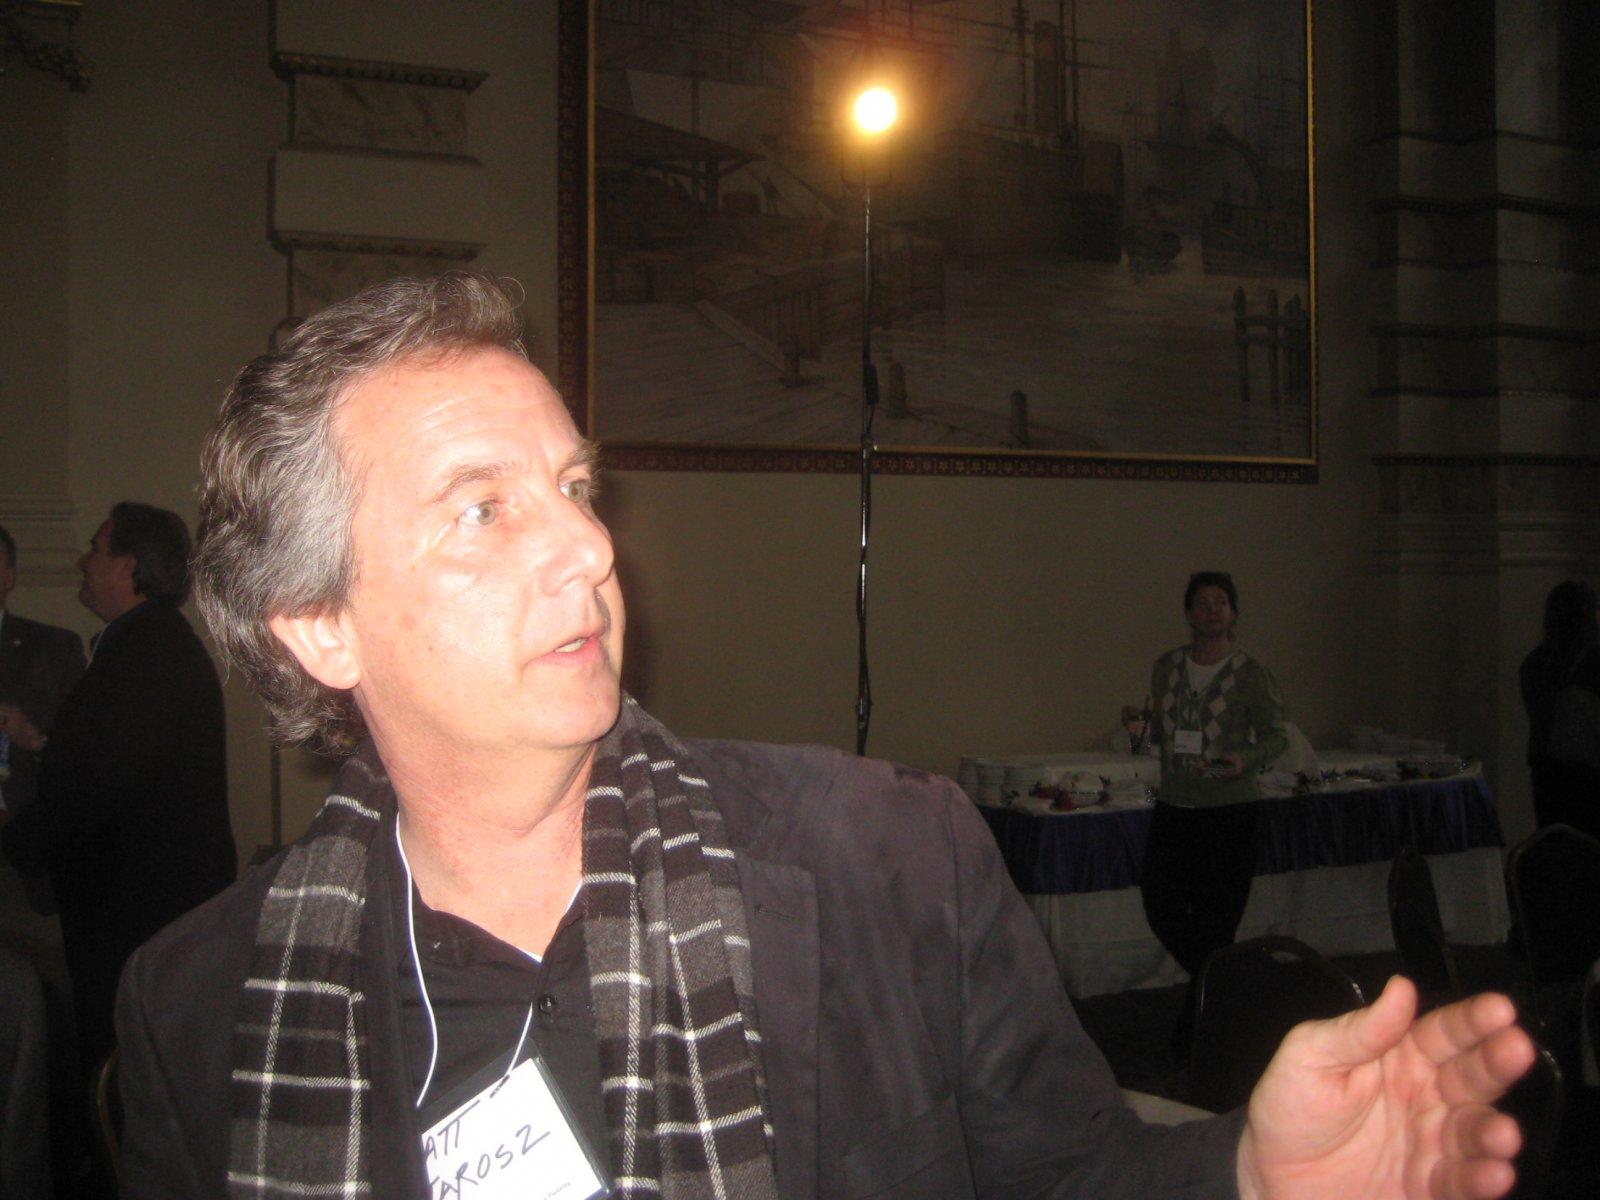 Matt Jarosz